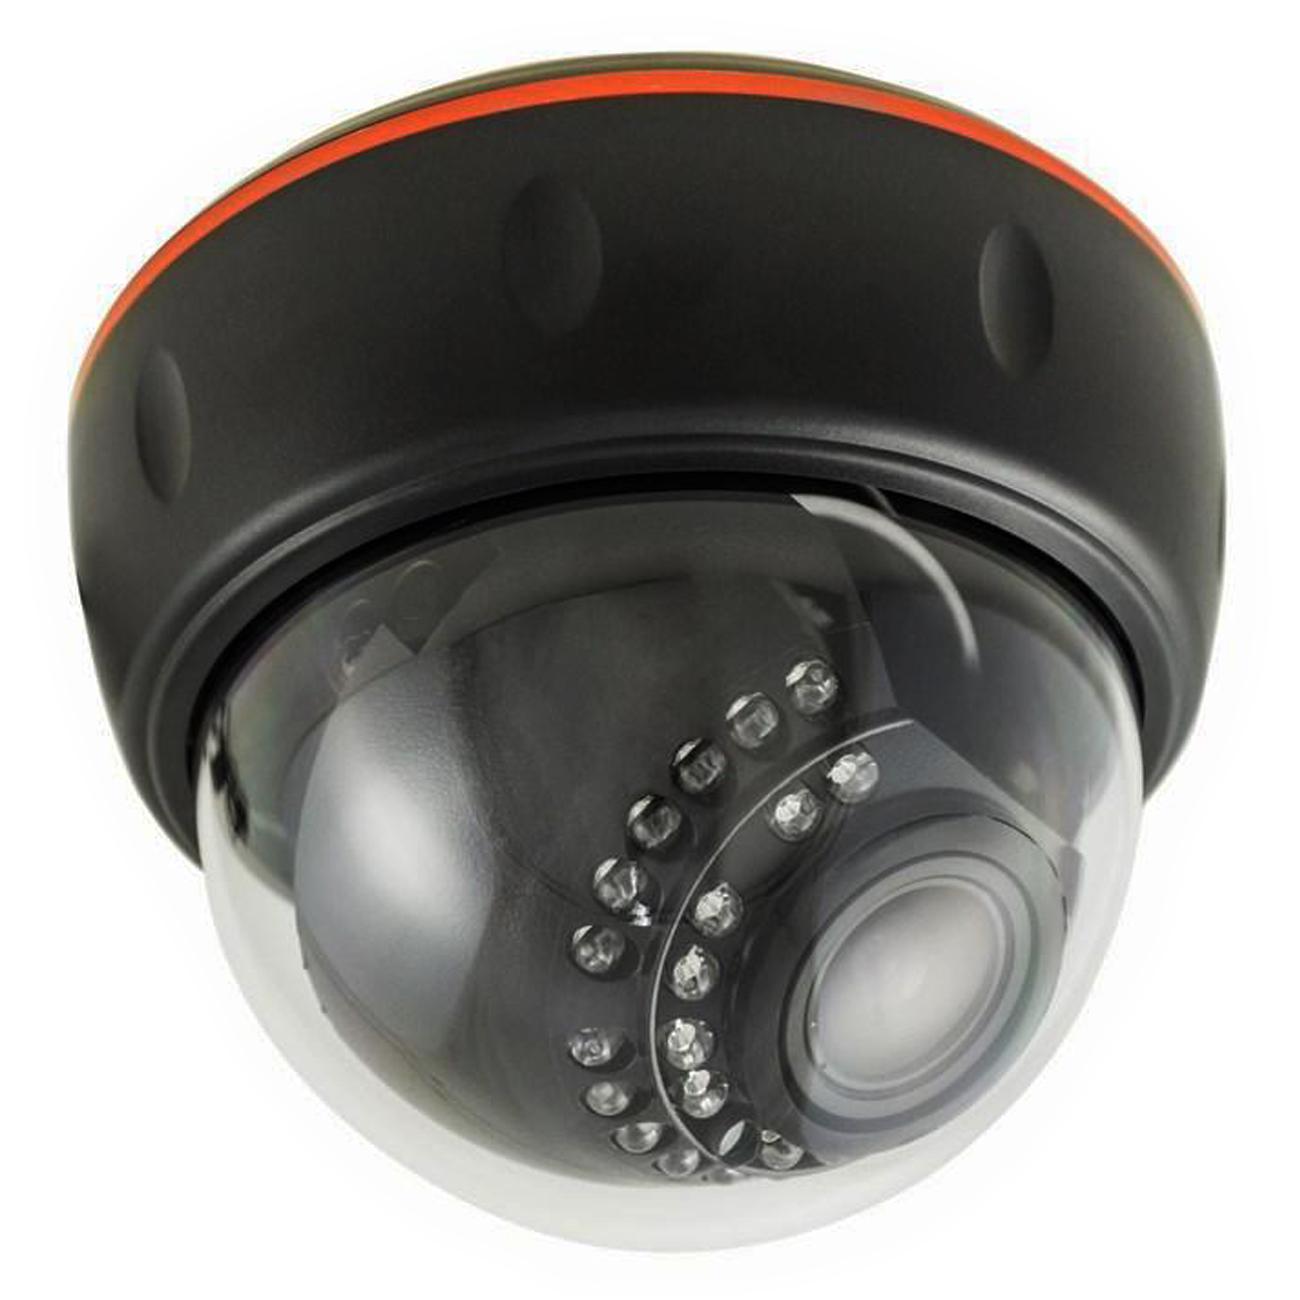 Фото Купольная IP видеокамера Rexant 4 Мп, ИК 30 м, PoE {45-0372}